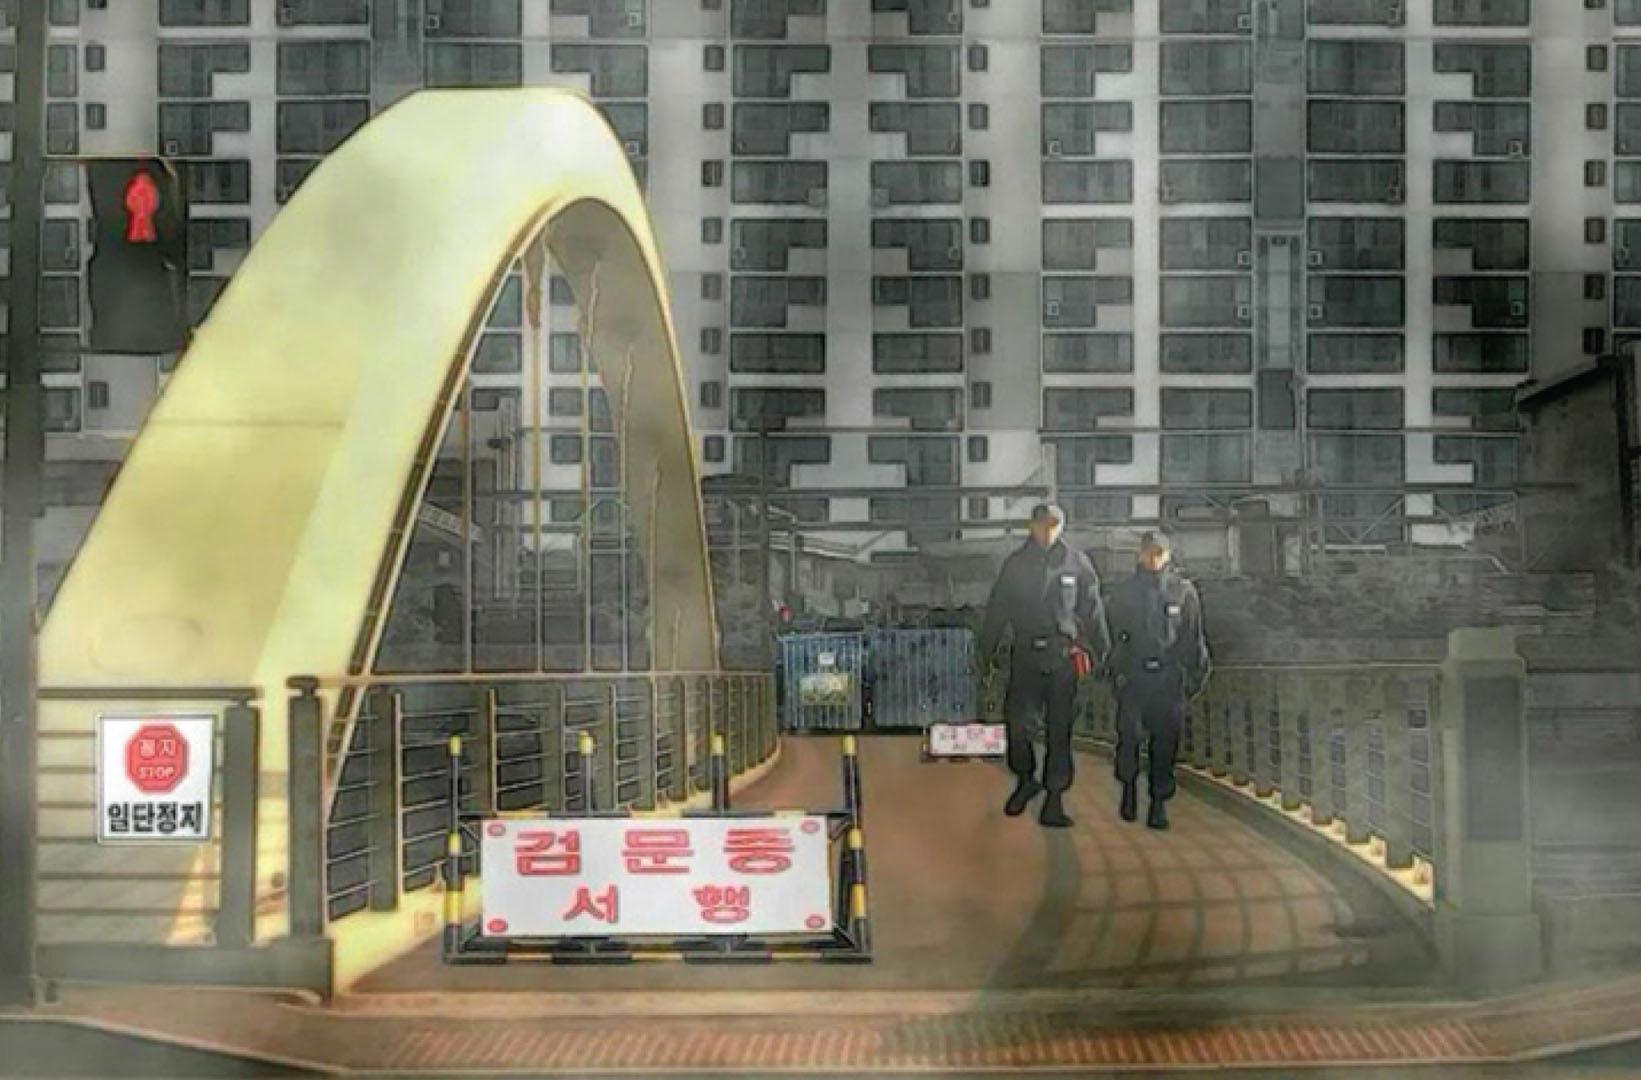 ©, Gyuwan Choe, Jin Wan Park, Seonhee Park, Eunsun Jang, and Hoyeon Jang, Special Habitation